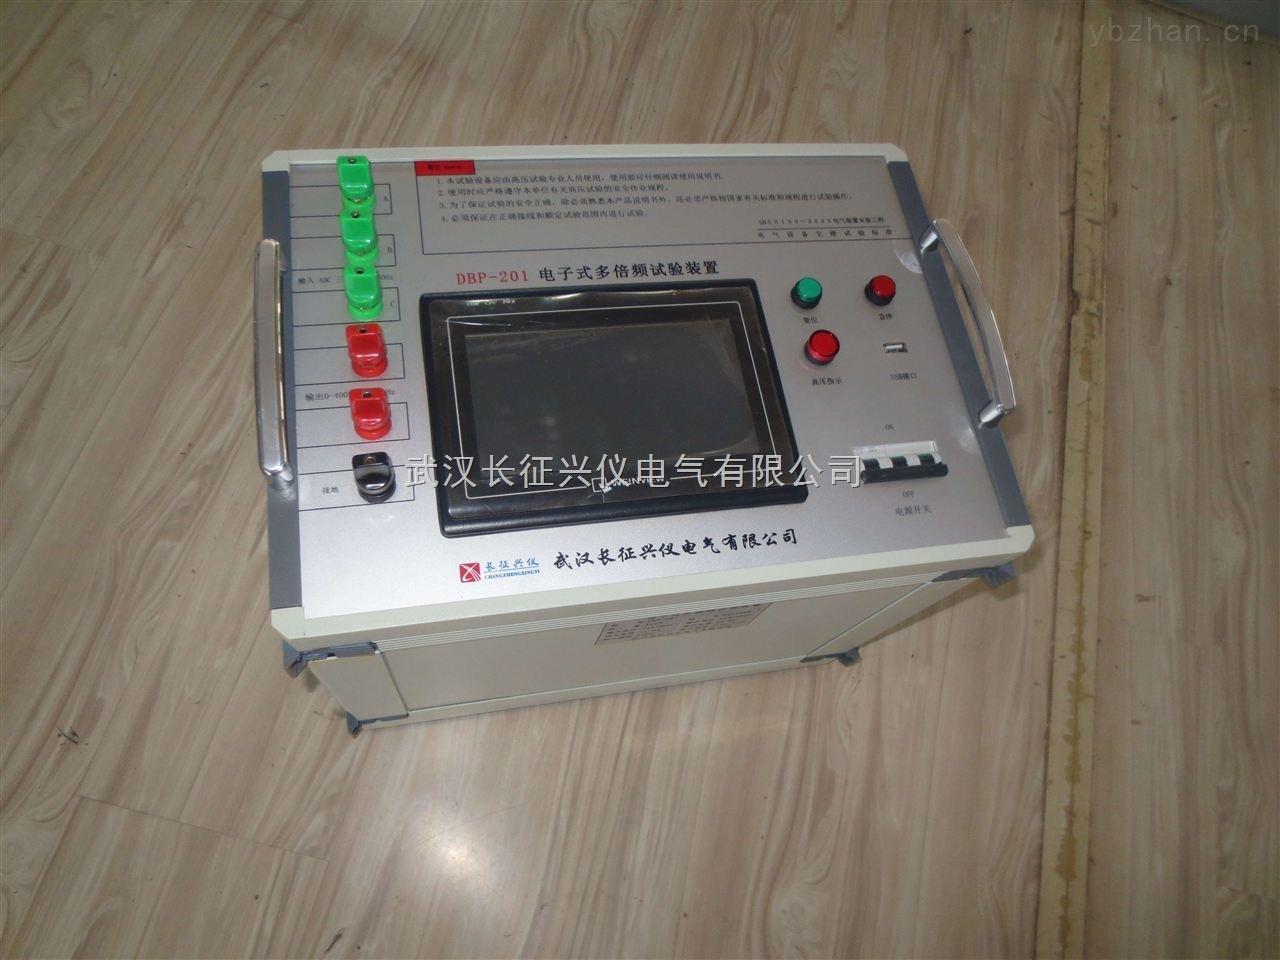 DBP-201 电子式多倍频试验装置